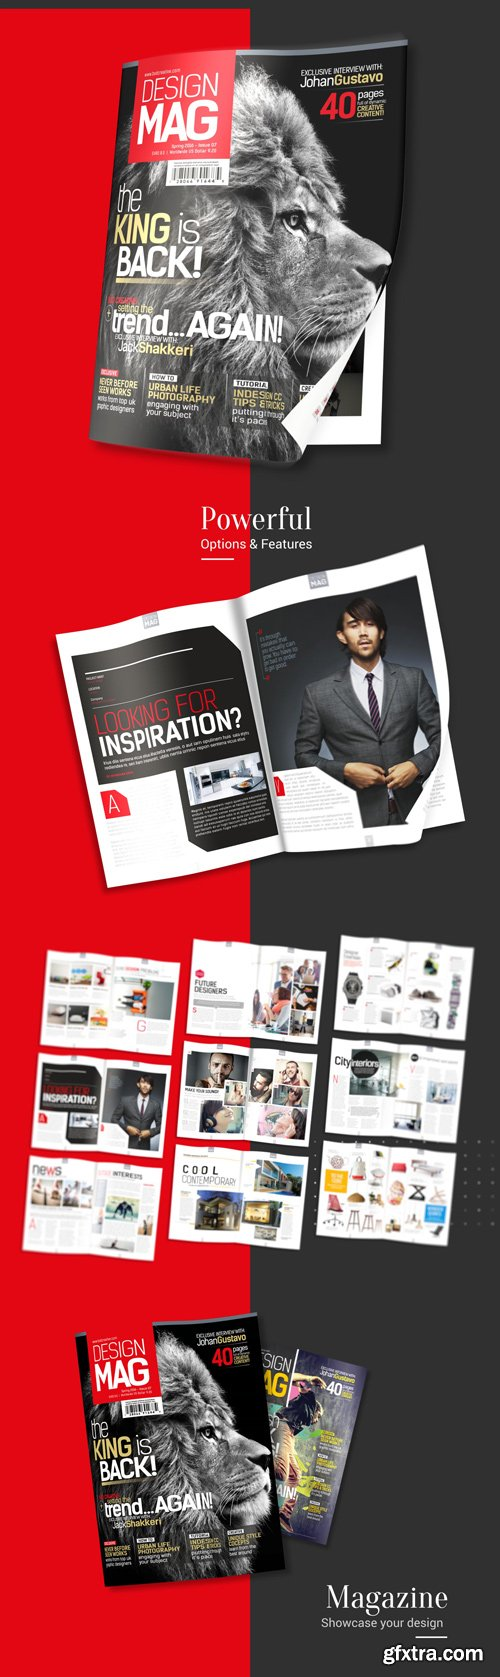 Videohive - Magazine Promo Toolkit - 22145727